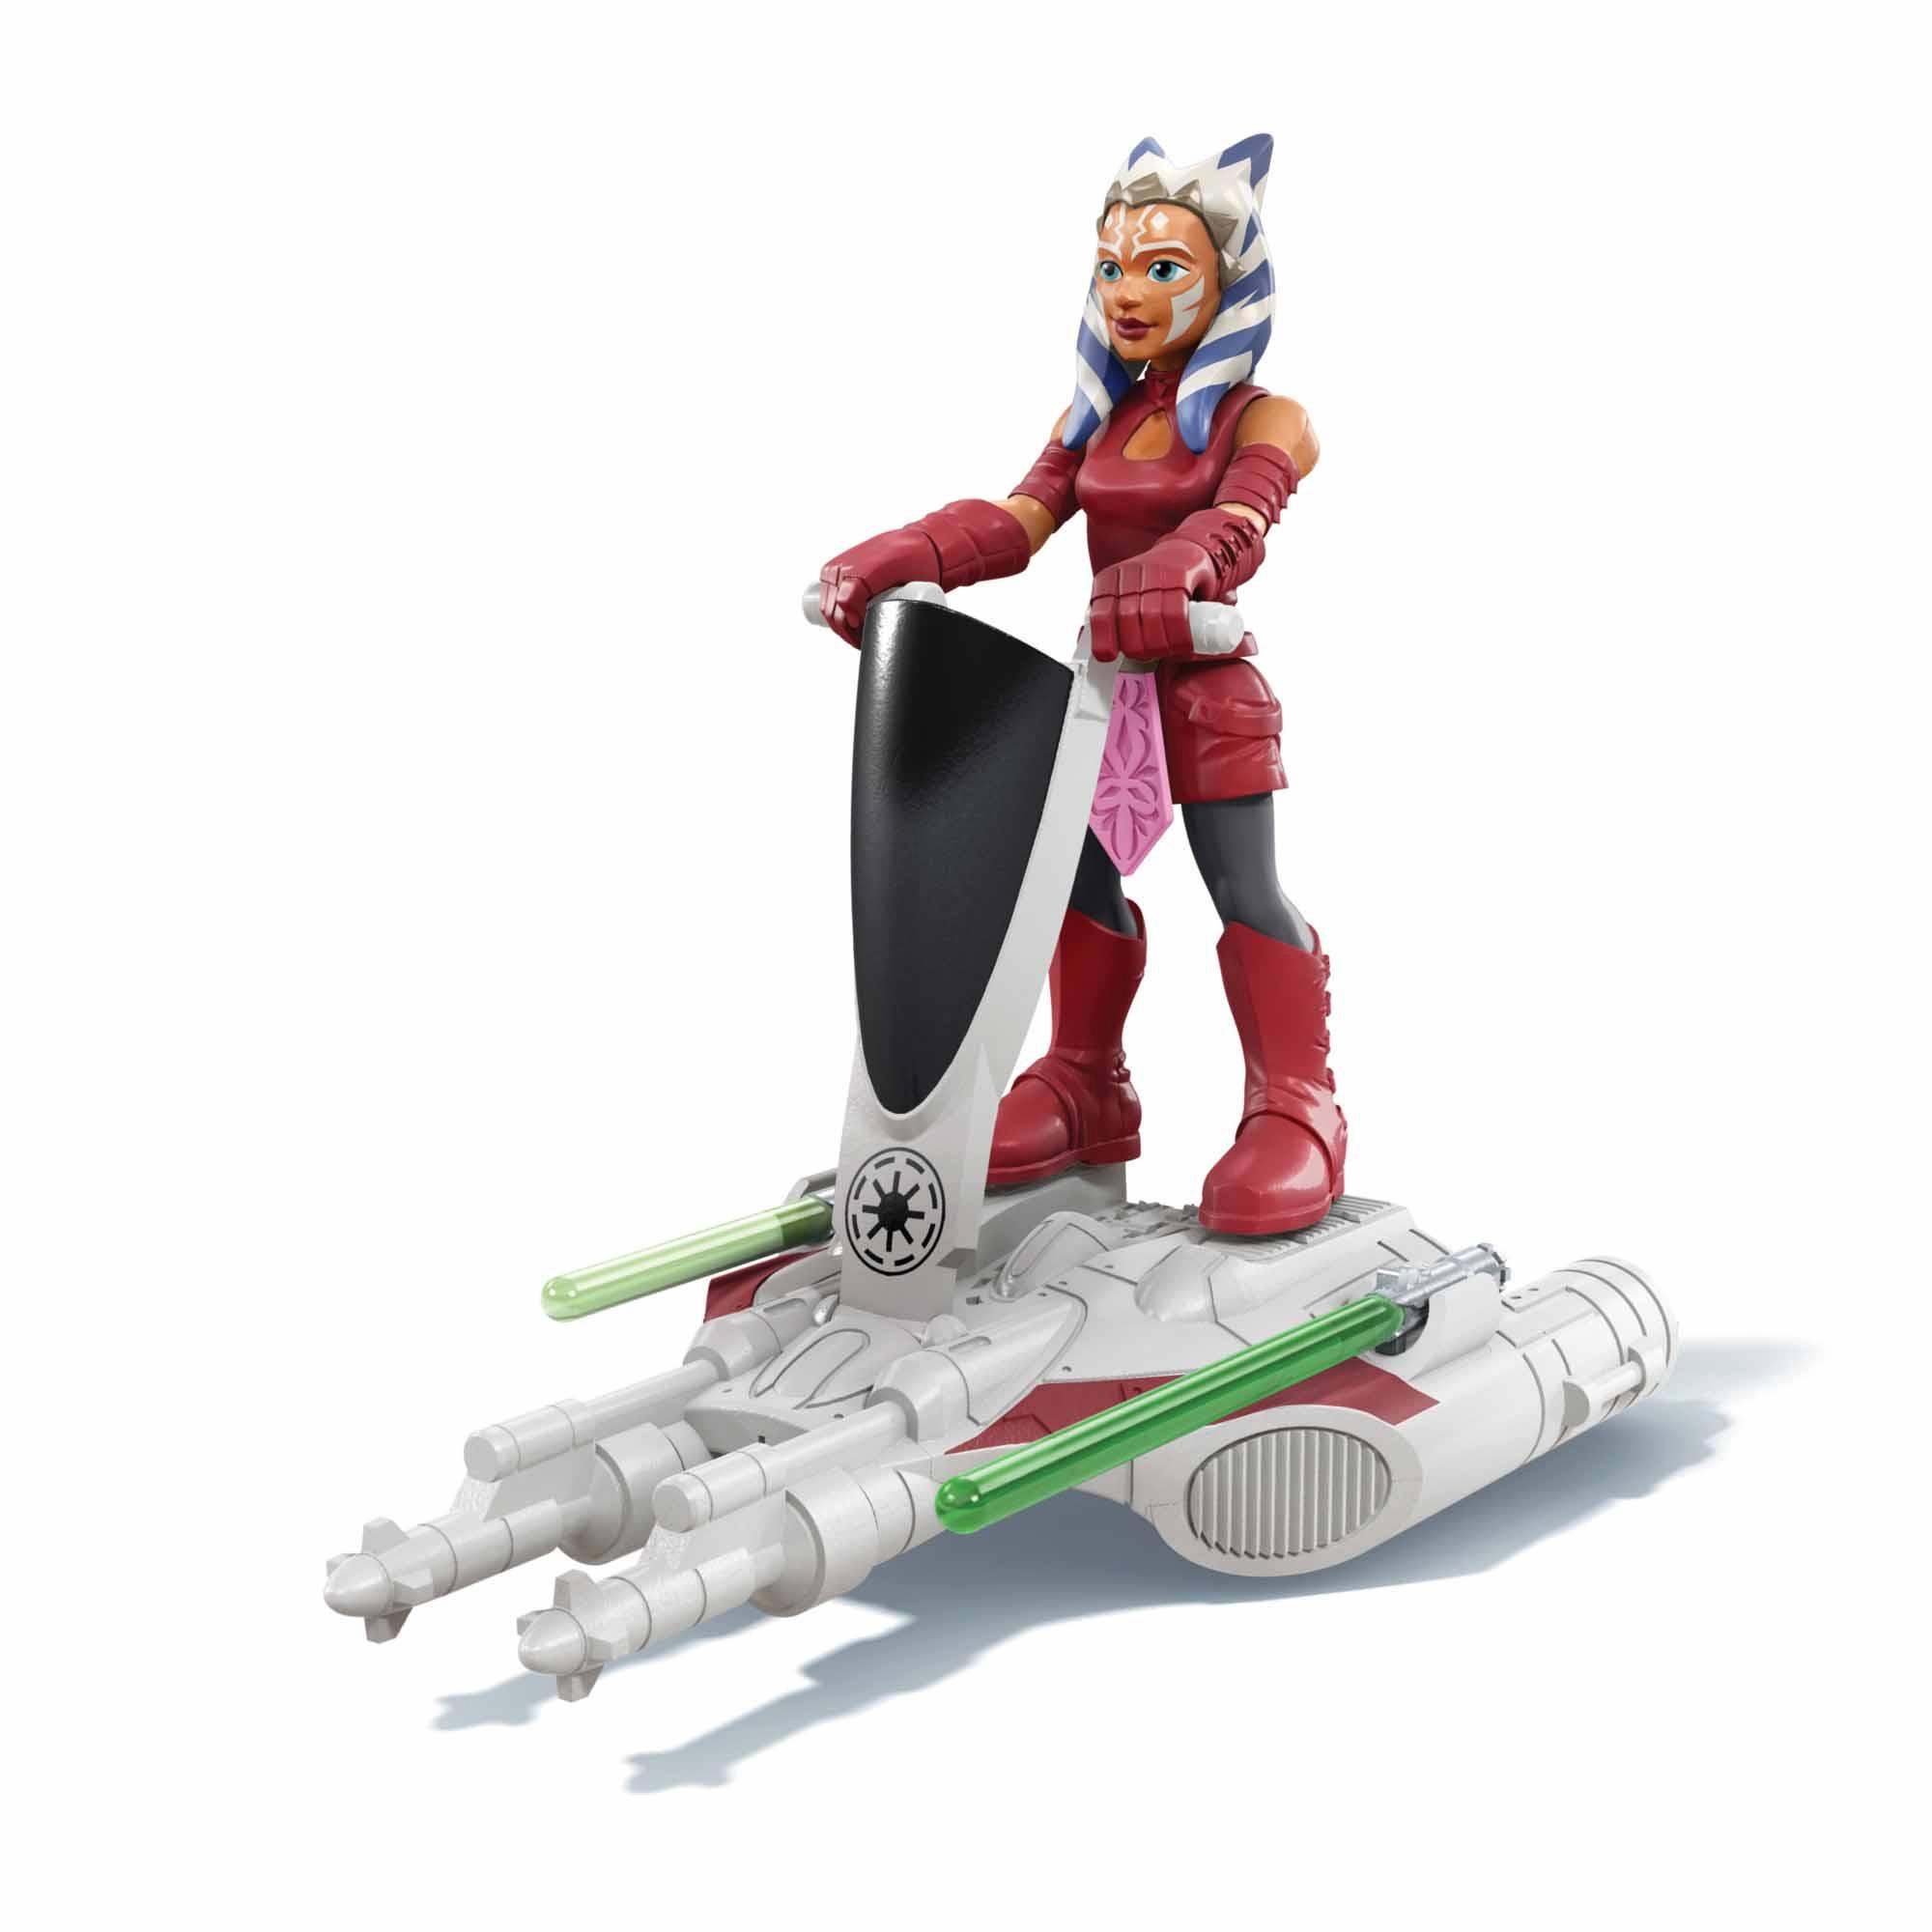 Star Wars Mission Fleet - Ahsoka Tano Aquatic Attack